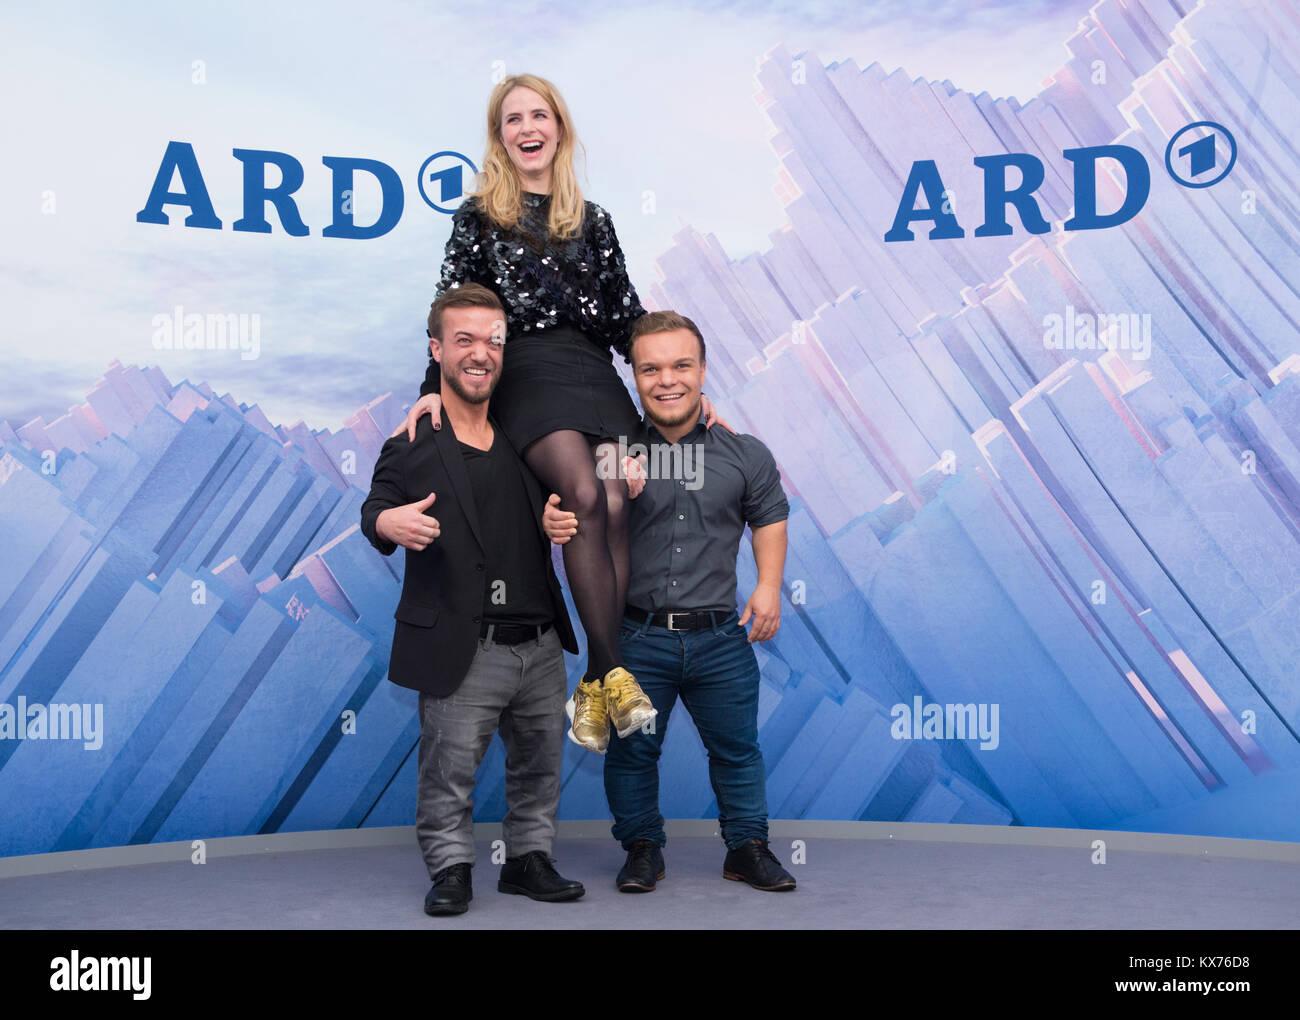 Berlin, Deutschland. 12th Dec, 2017. Mathias MESTER (ARD Paralympics-Experte) und Niko KAPPEL (ARD Paralympics-Experte) Stock Photo